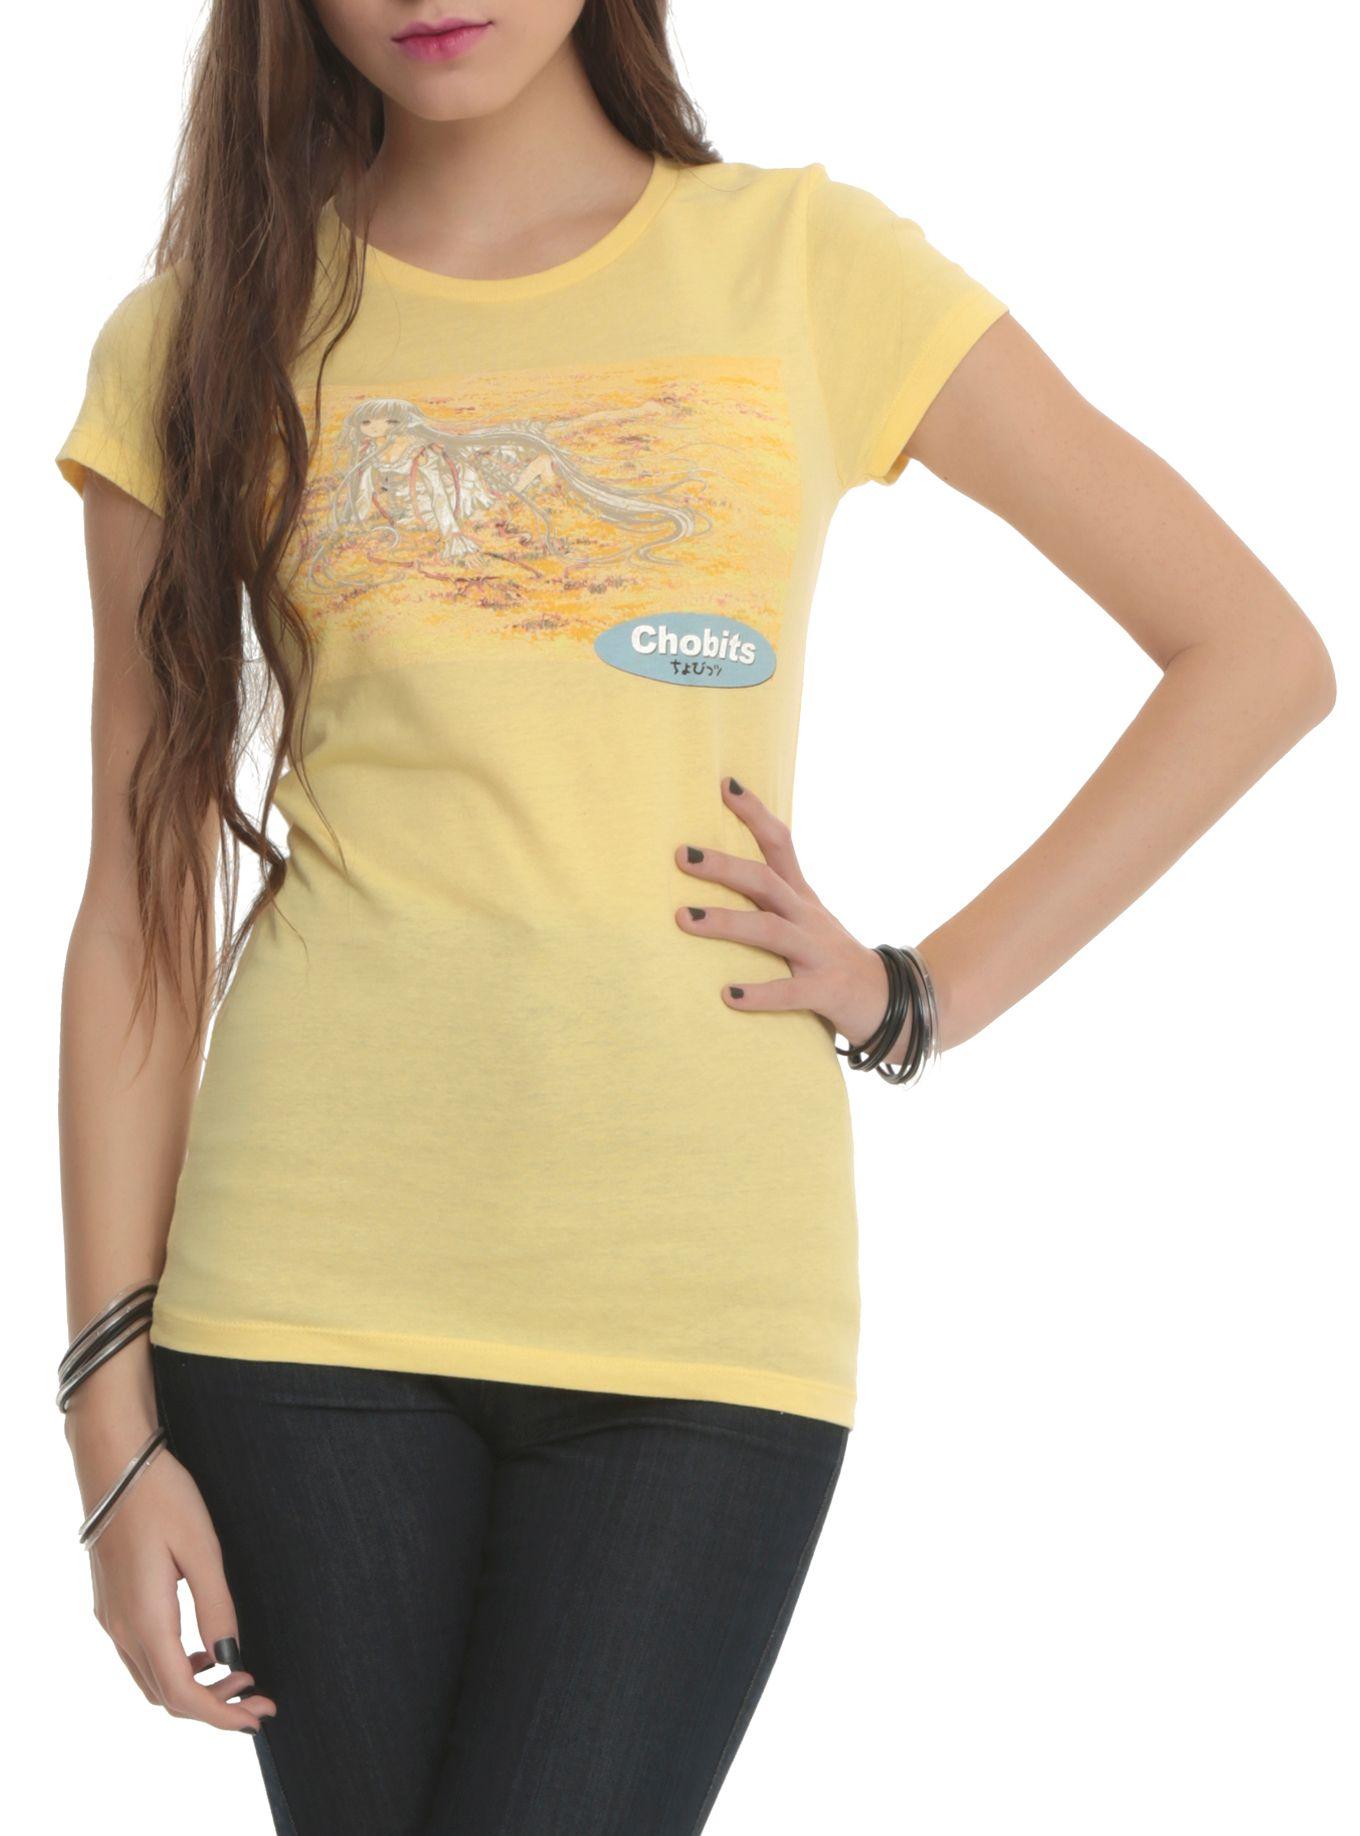 Chobits Chii Girls T-Shirt | Hot Topic